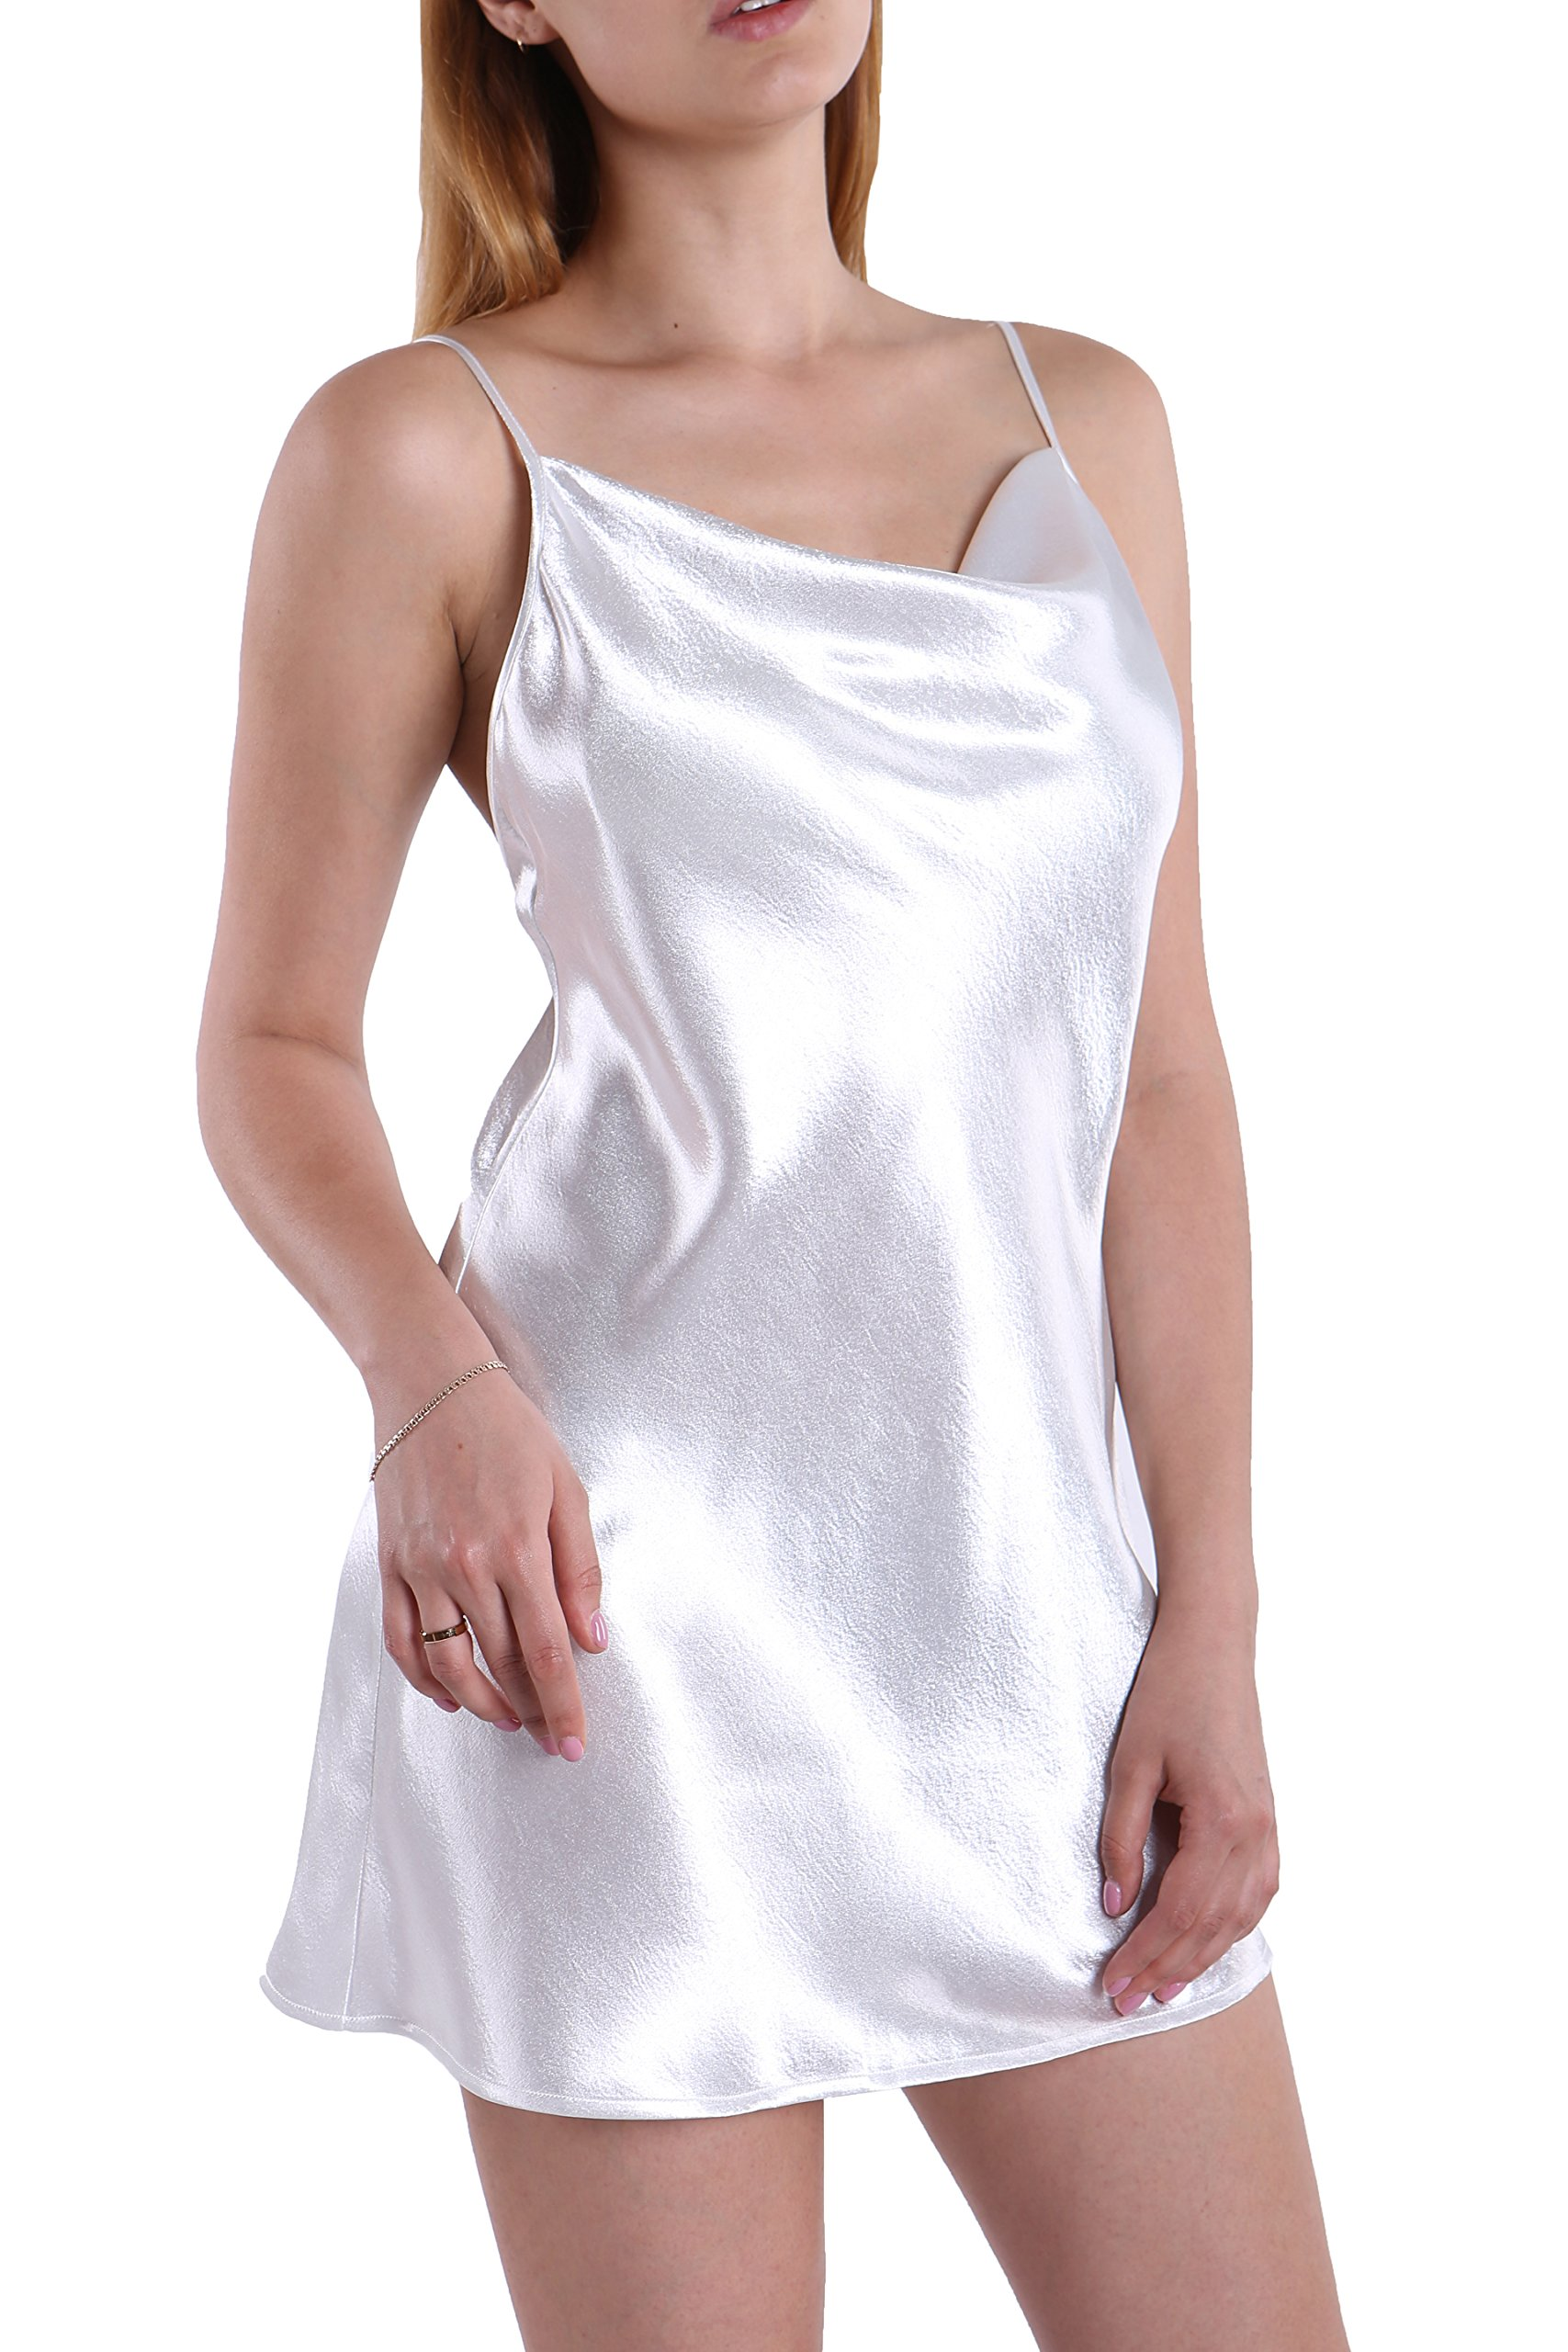 Fyriona Women's Satin Slip Dress Backless Nightgown Long Camisole Top Basic Layering Chemise Cowl Neck Mini Slip Dress White M